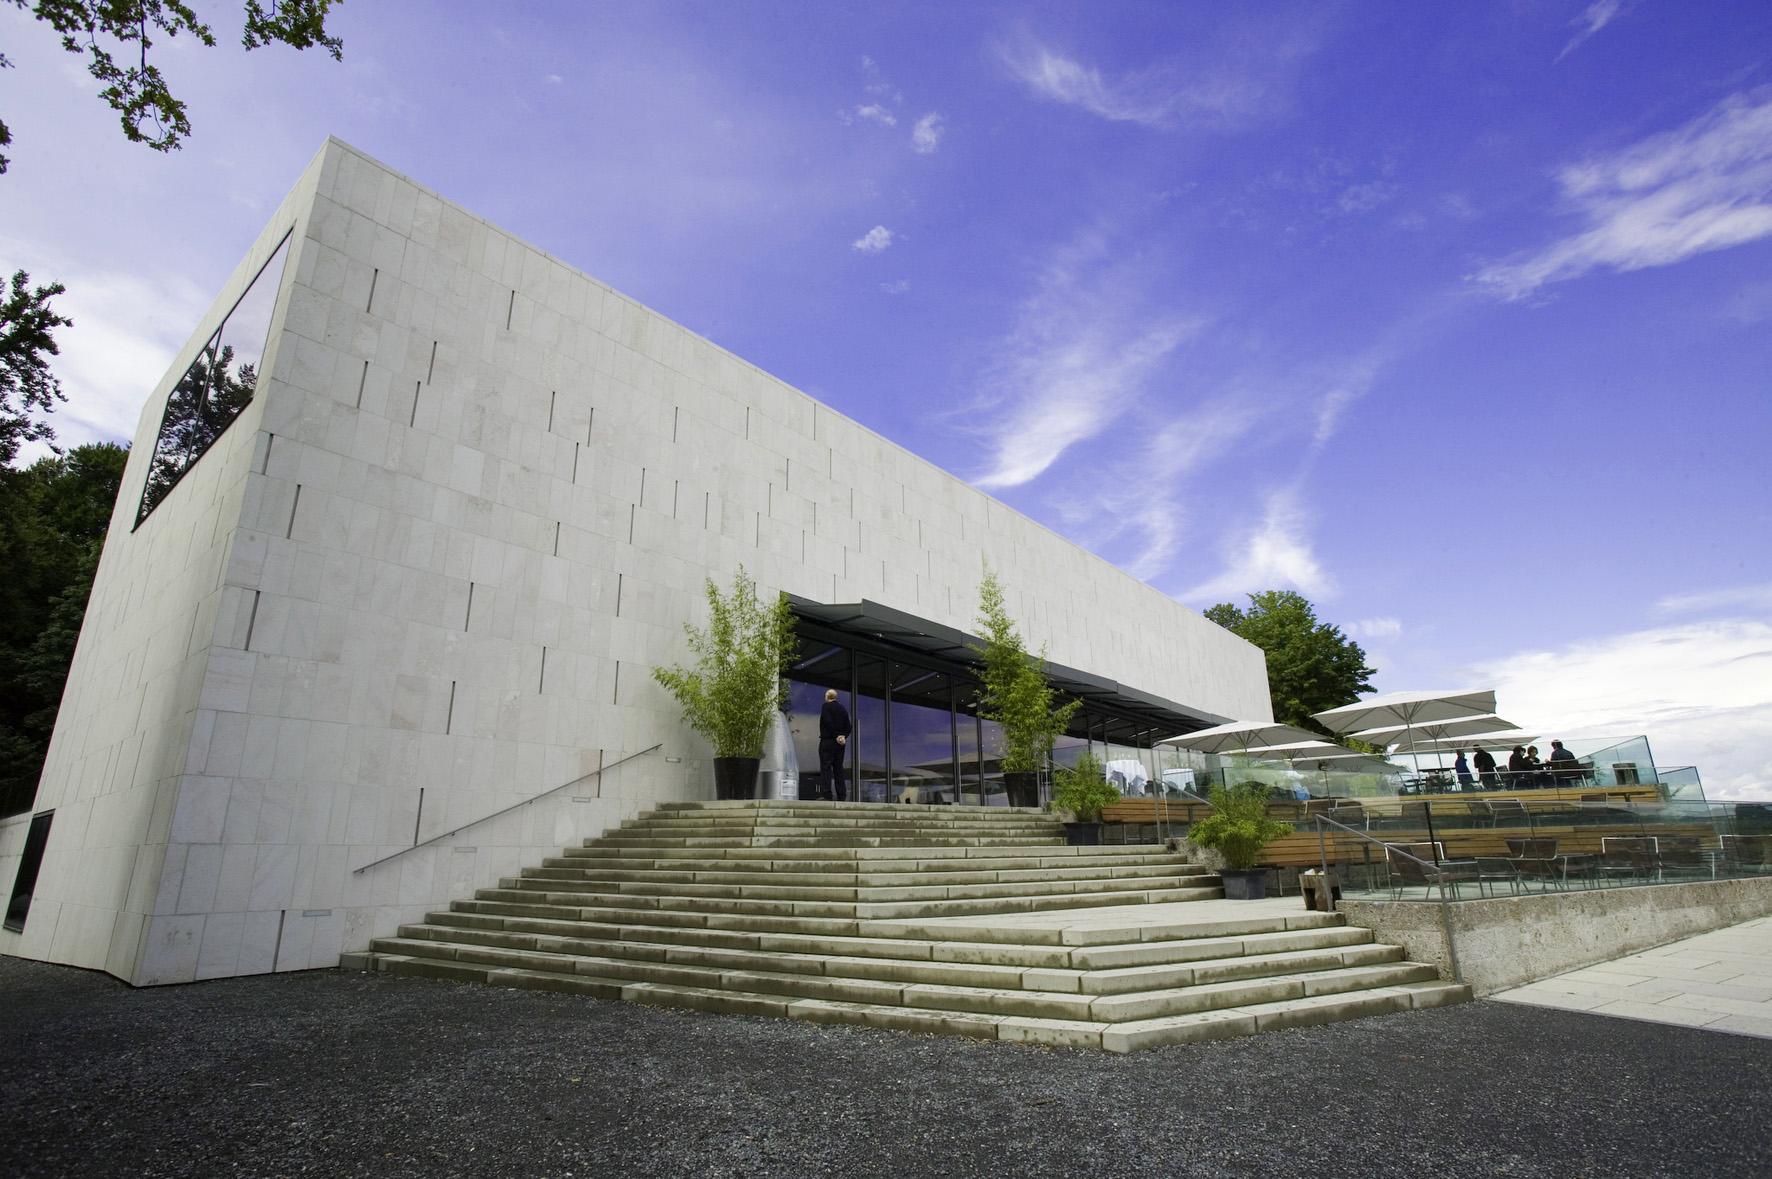 zalcburga-muzejs-der-moderne-uz-monchsber-secret-world